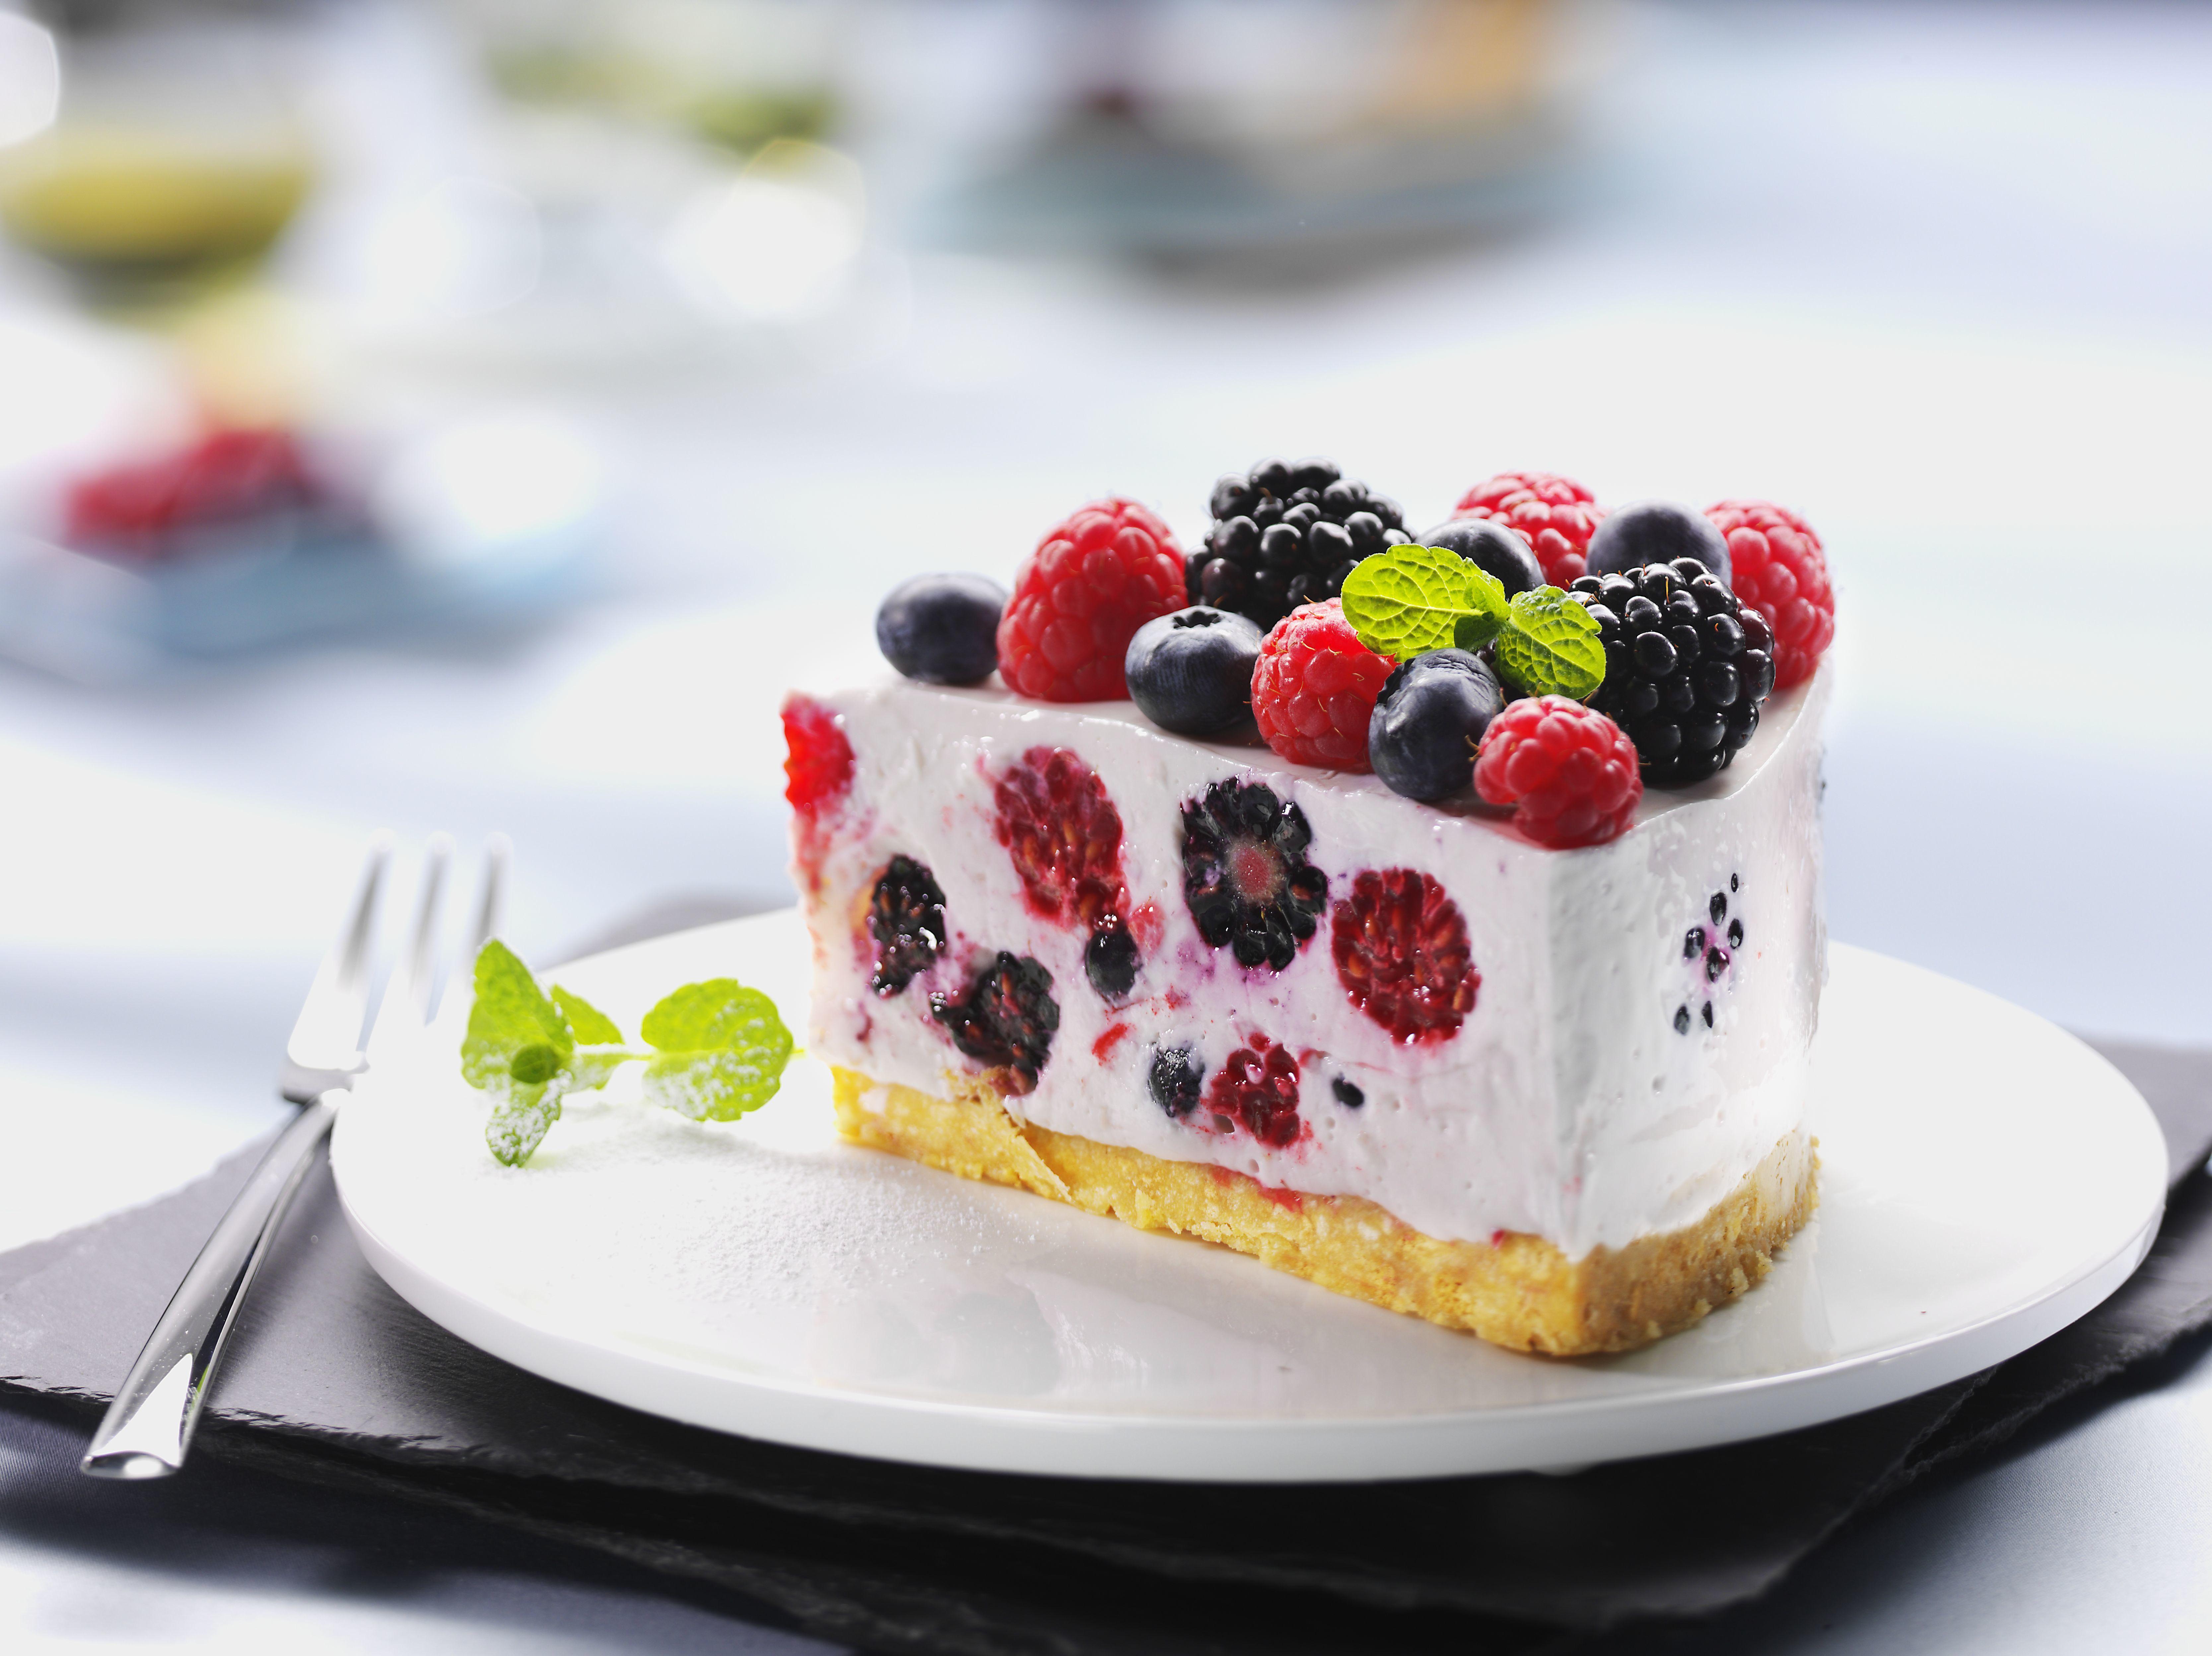 Blueberry Cake Description